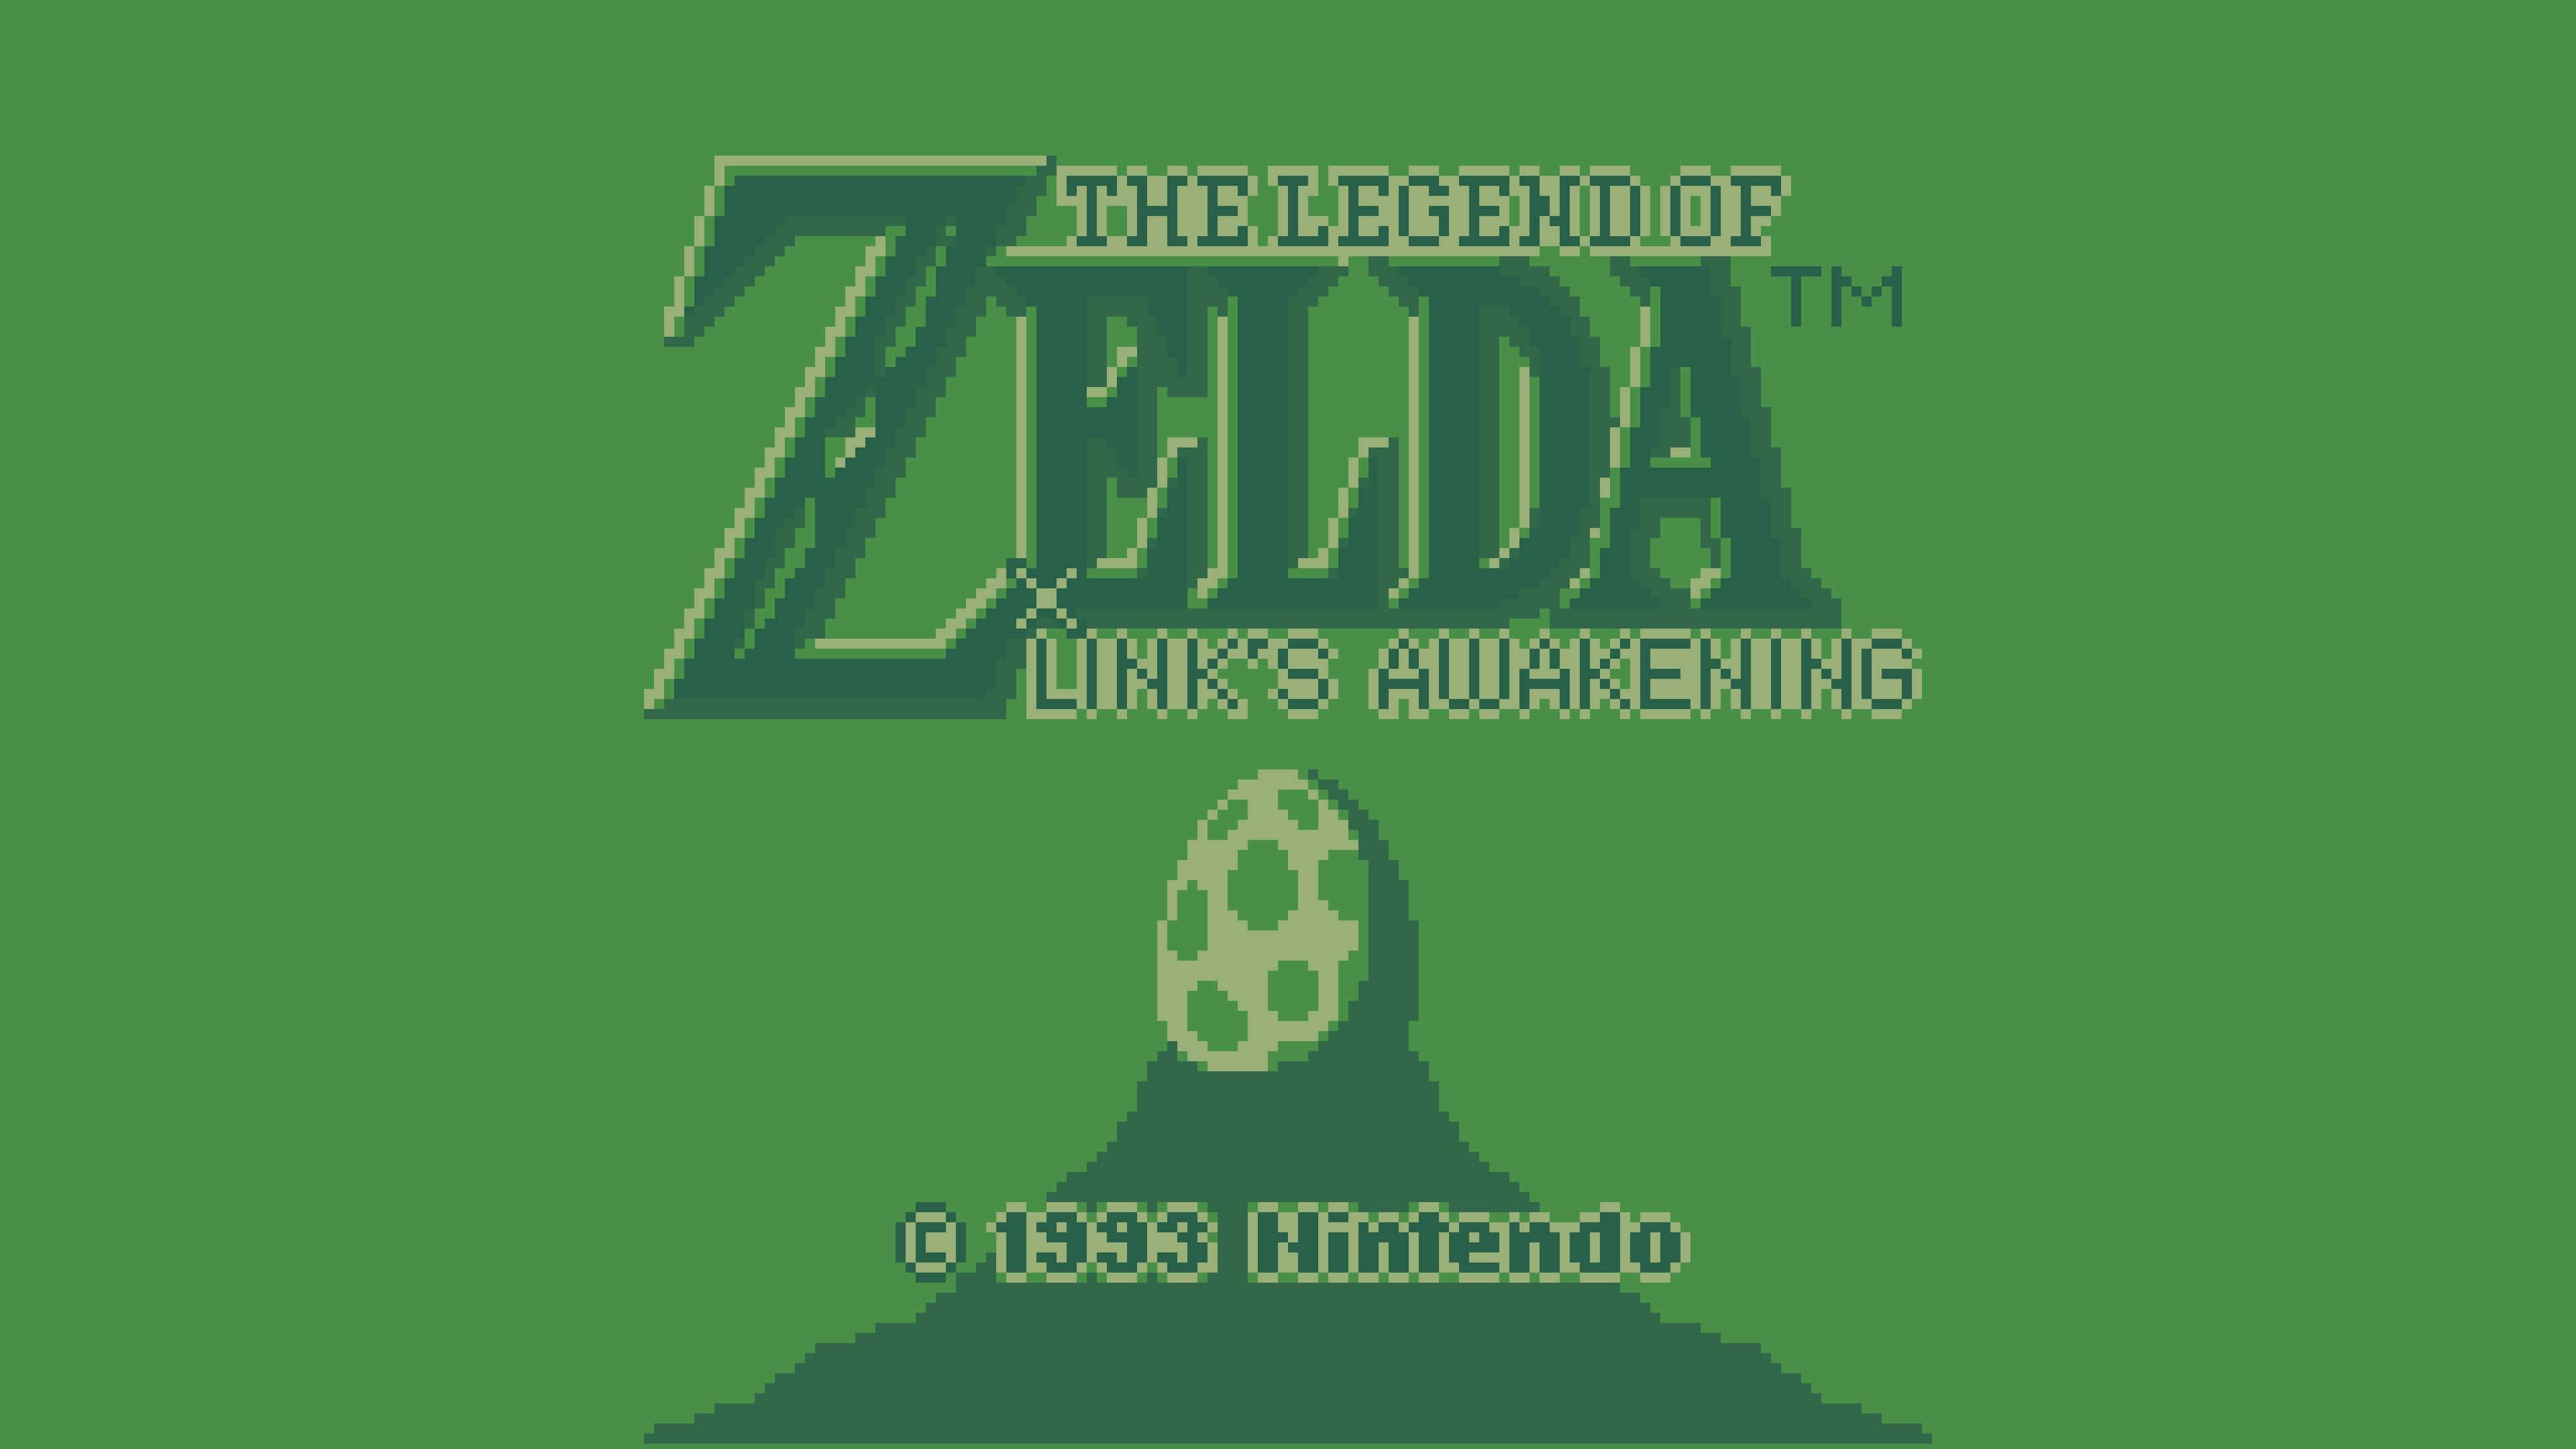 The Legend Of Zelda Links Awakening Game Boy Screenshot Uhd 4k